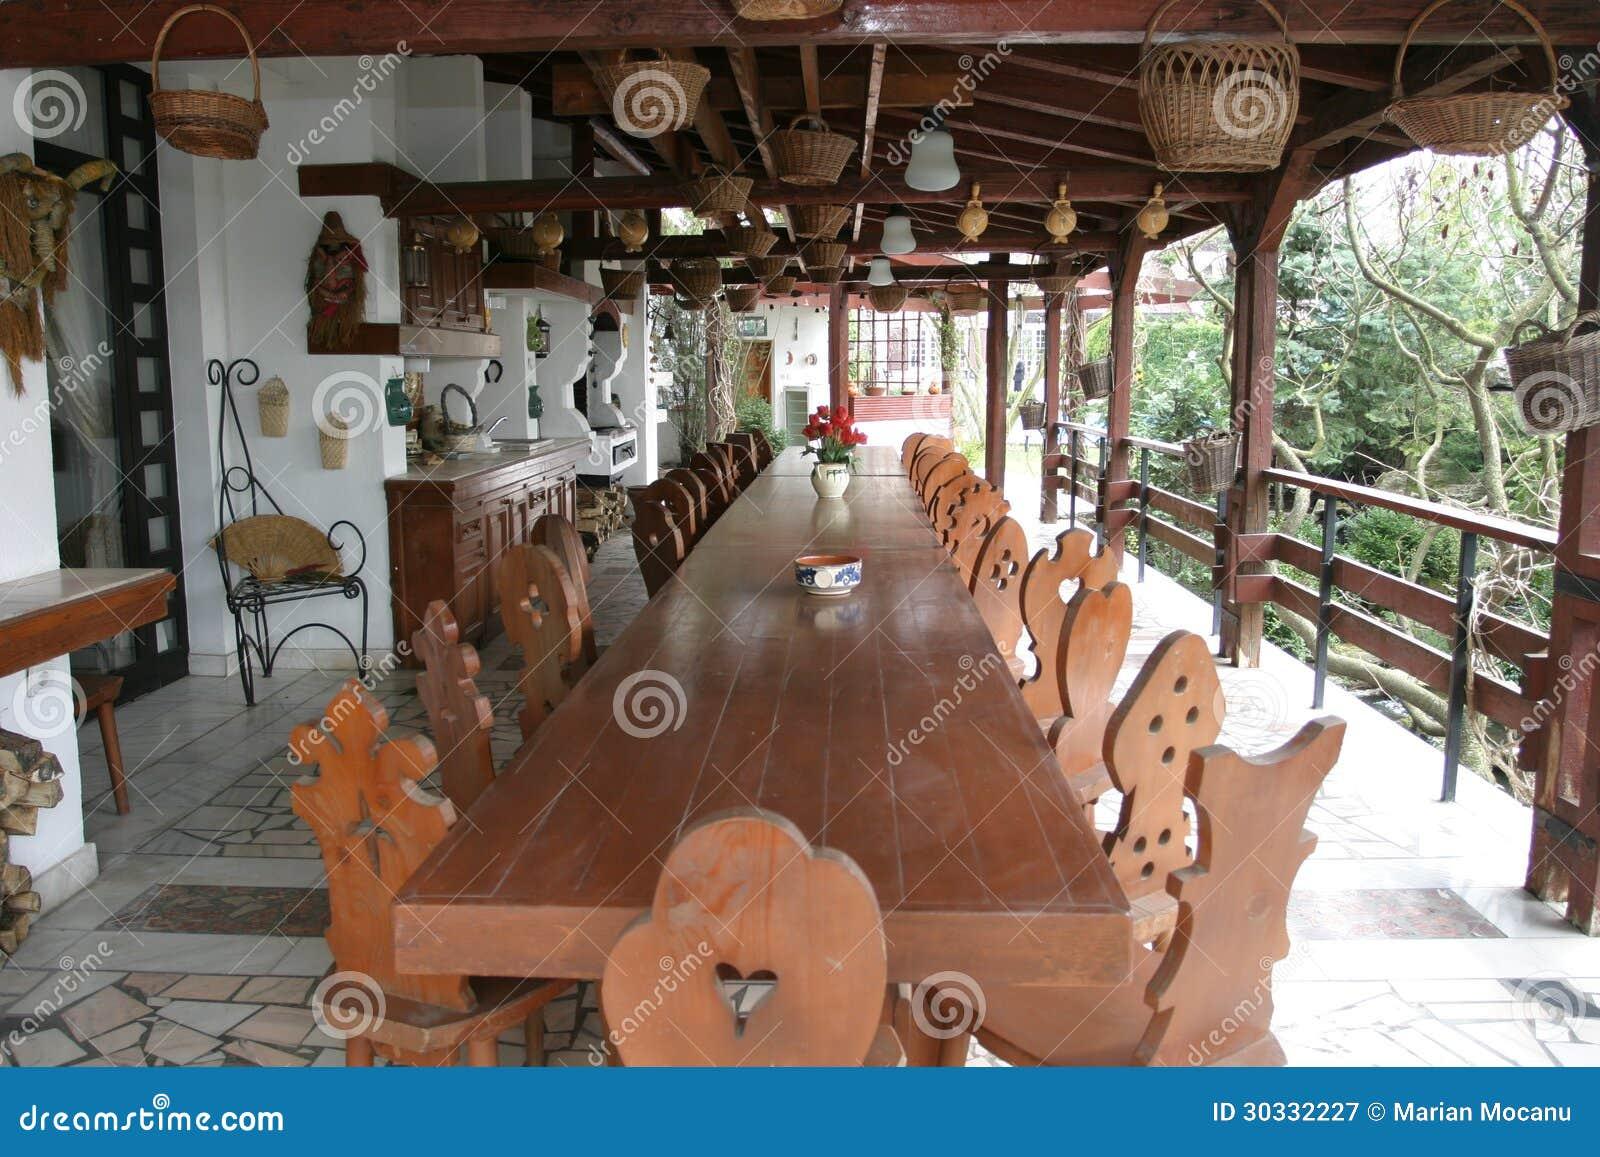 Rustikale Terrasse Stockbild Bild Von Hotel Leer Luxus 30332227